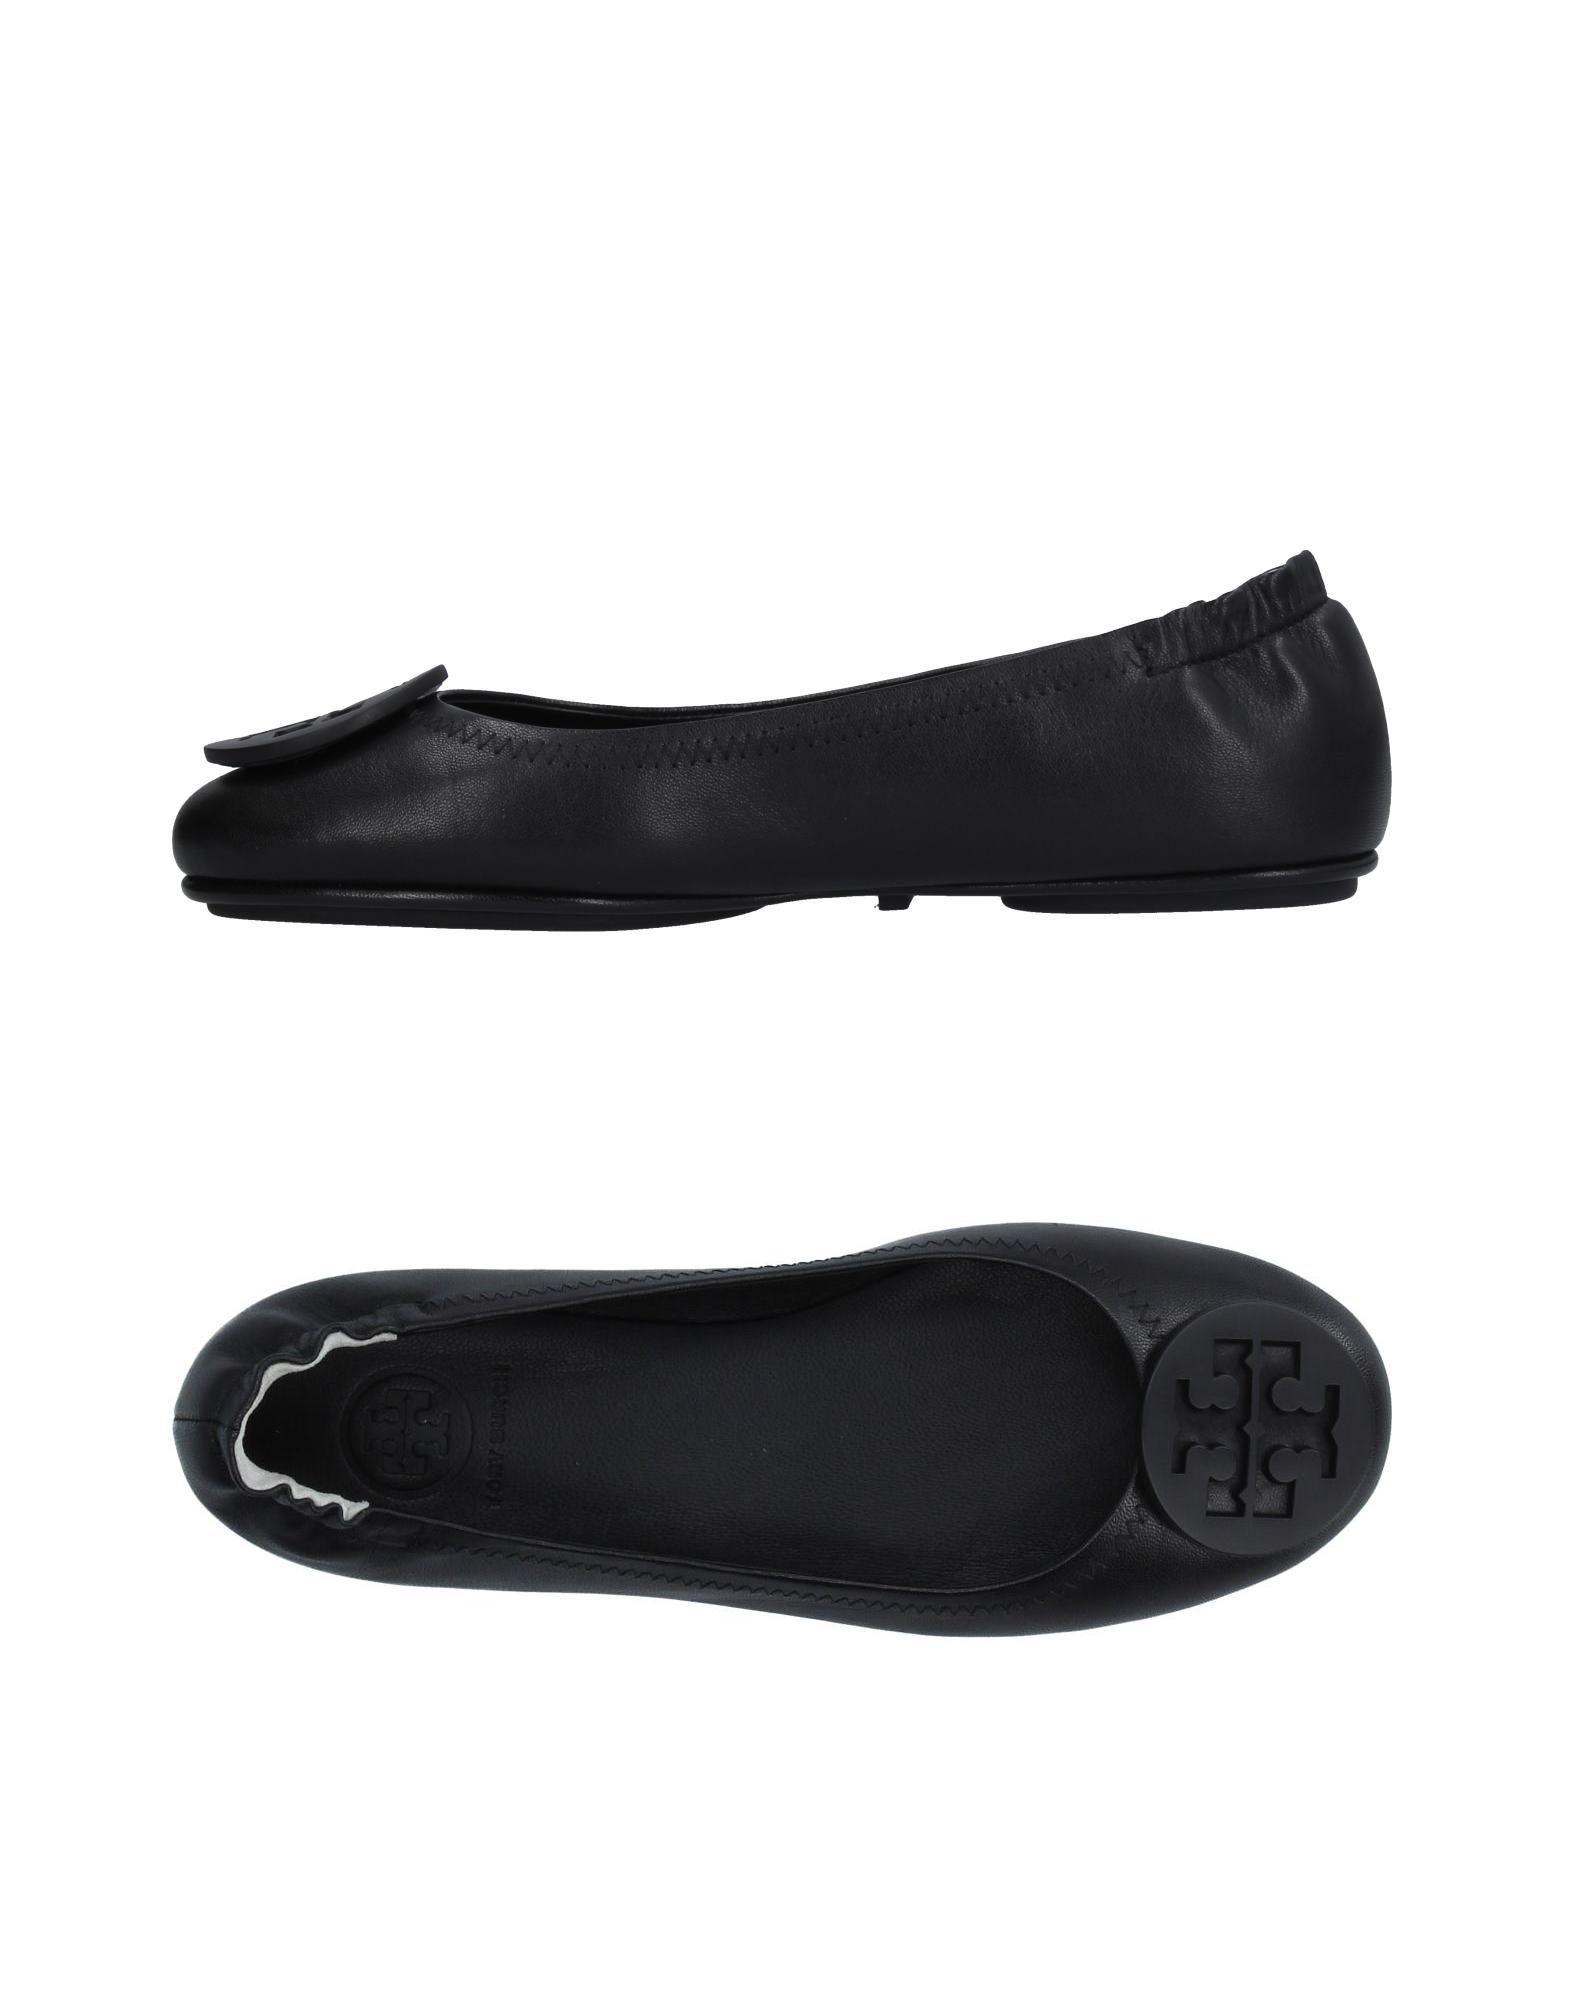 Tory Burch Ballerinas Damen  11211818TPGut aussehende strapazierfähige Schuhe